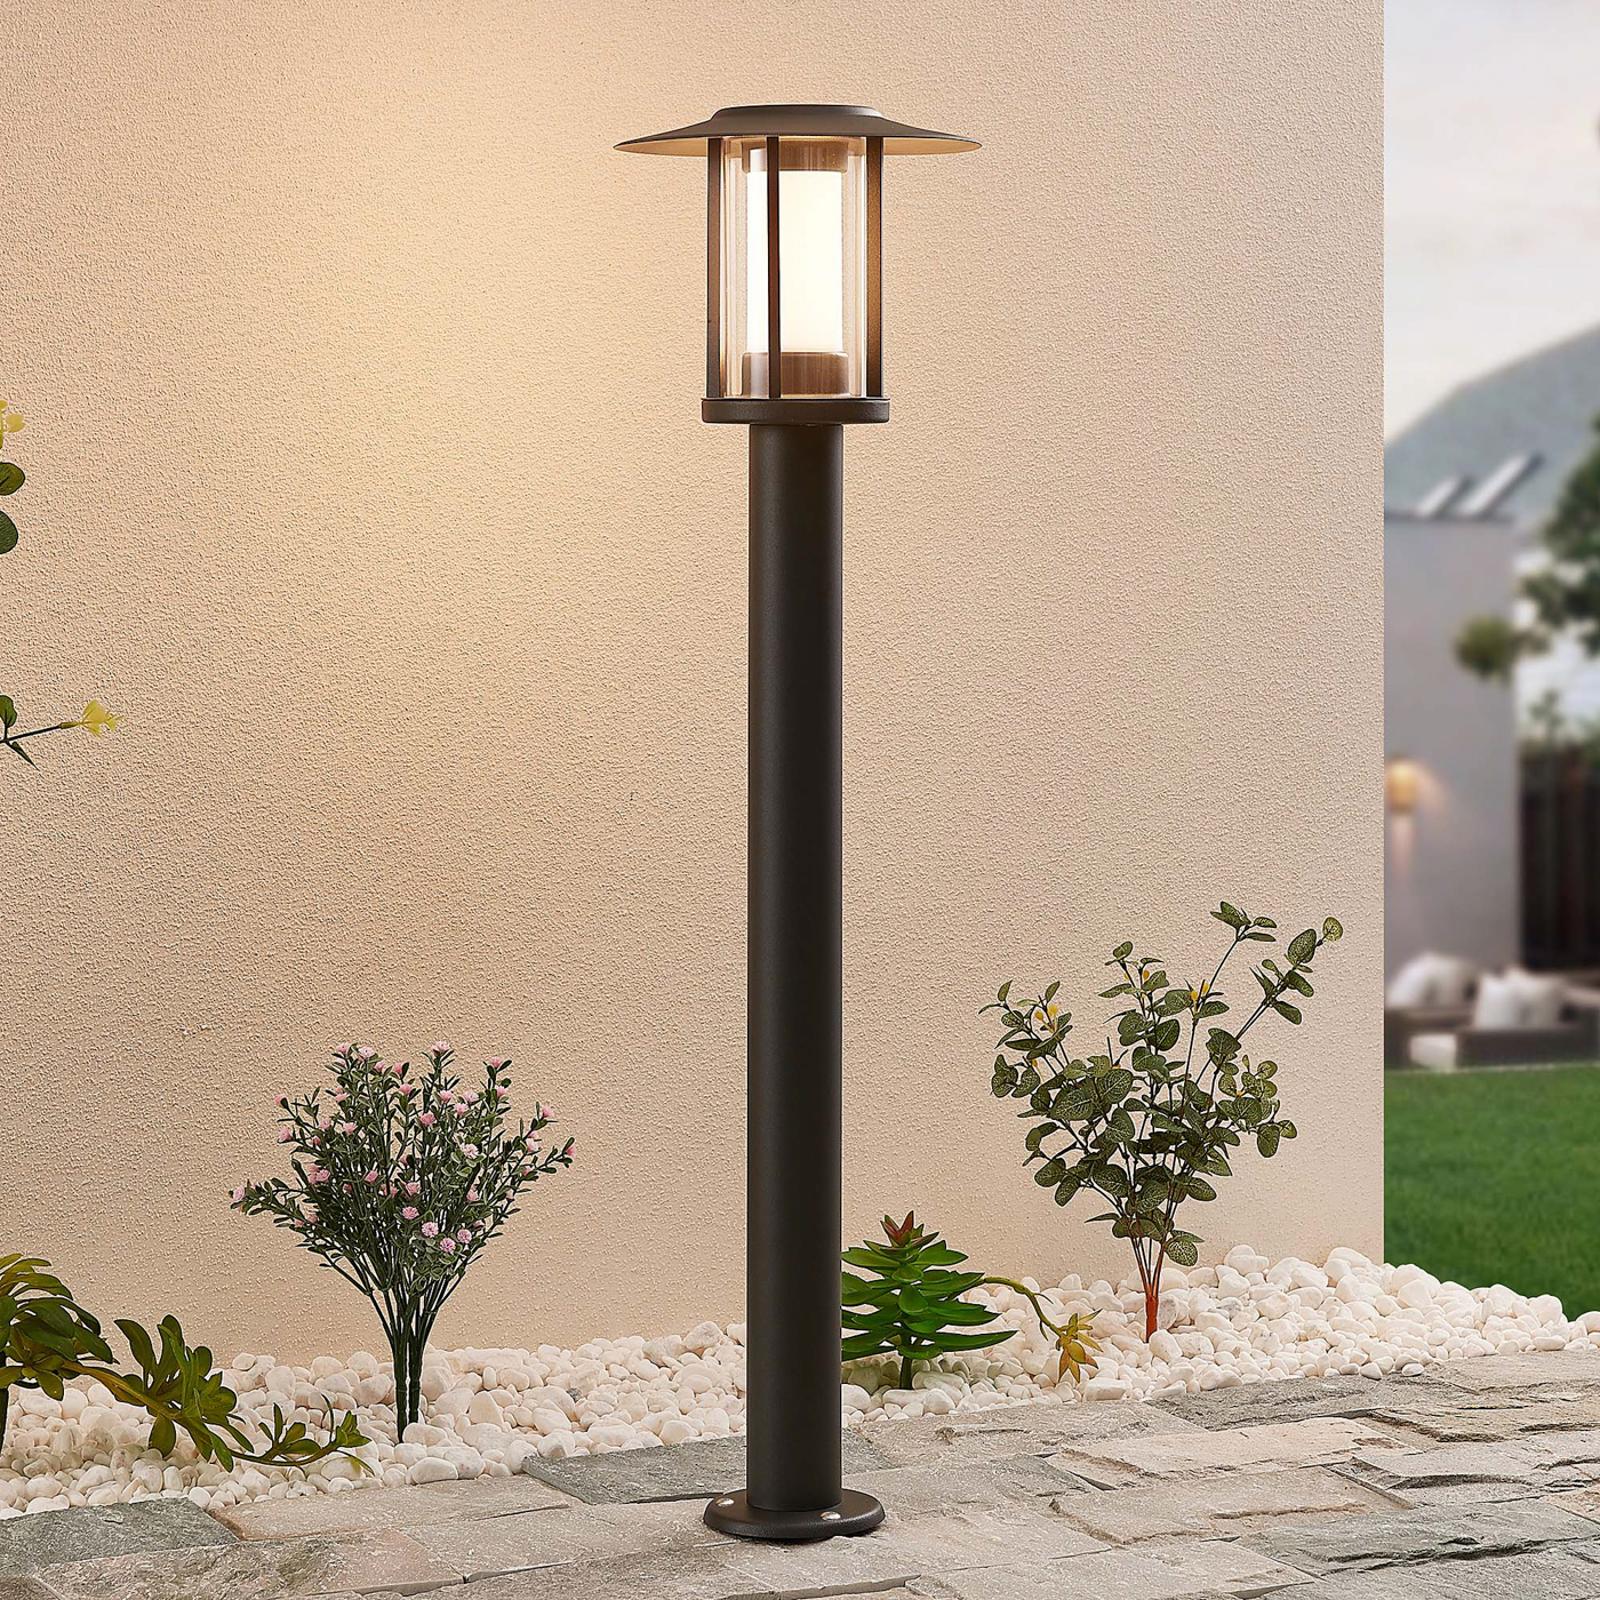 LED-gadelampe Gregory grå